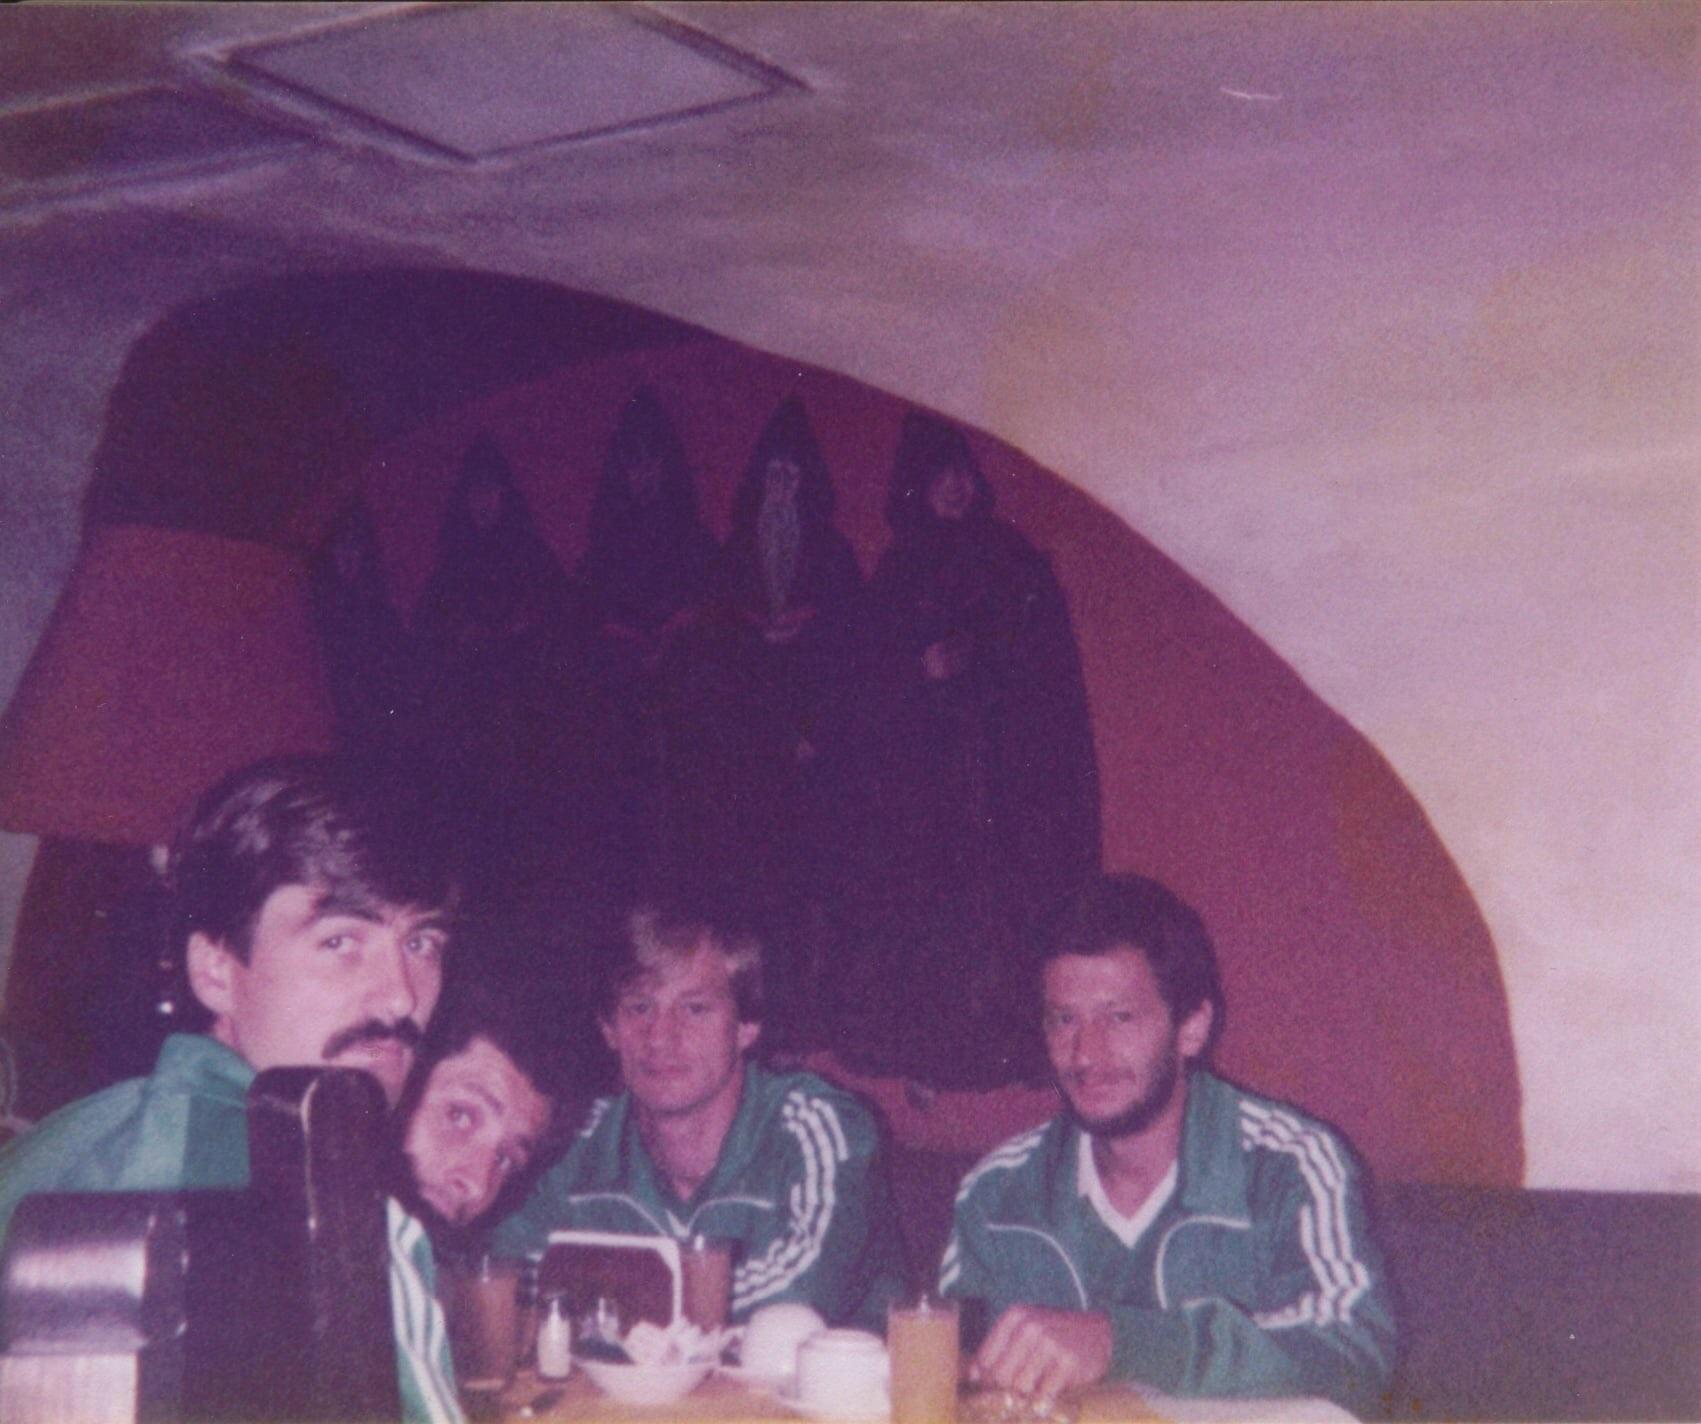 idokapszula_nb_i_1983_84_tavaszi_zaras_tabellaparade_raba_eto_mexiko_9.jpg